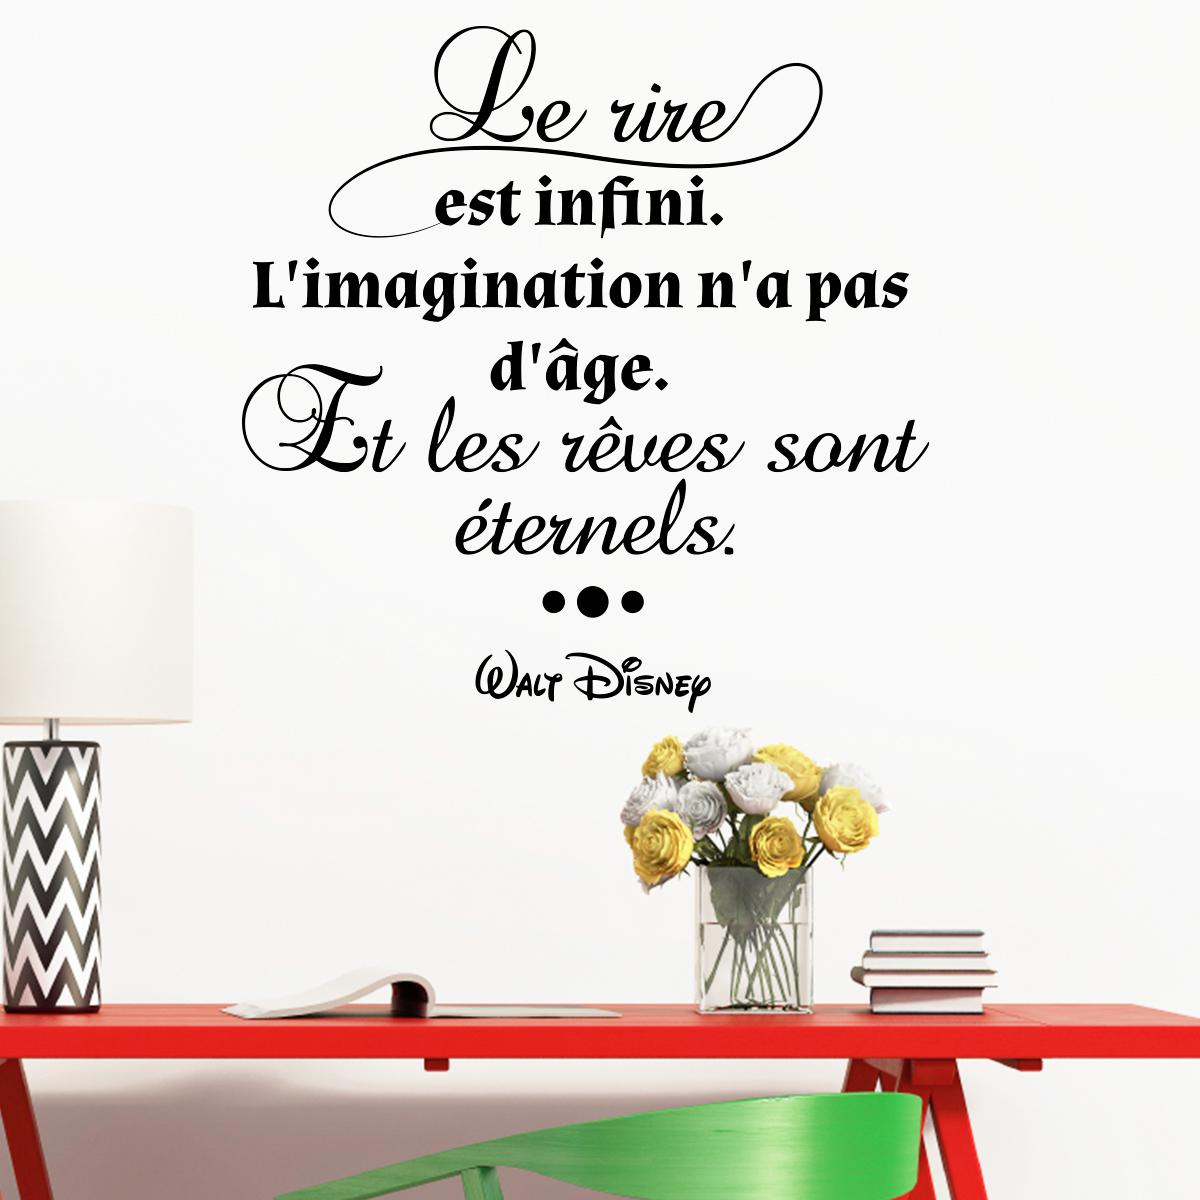 sticker citation l 39 imagination n 39 a pas d 39 ge walt disney stickers citations fran ais. Black Bedroom Furniture Sets. Home Design Ideas